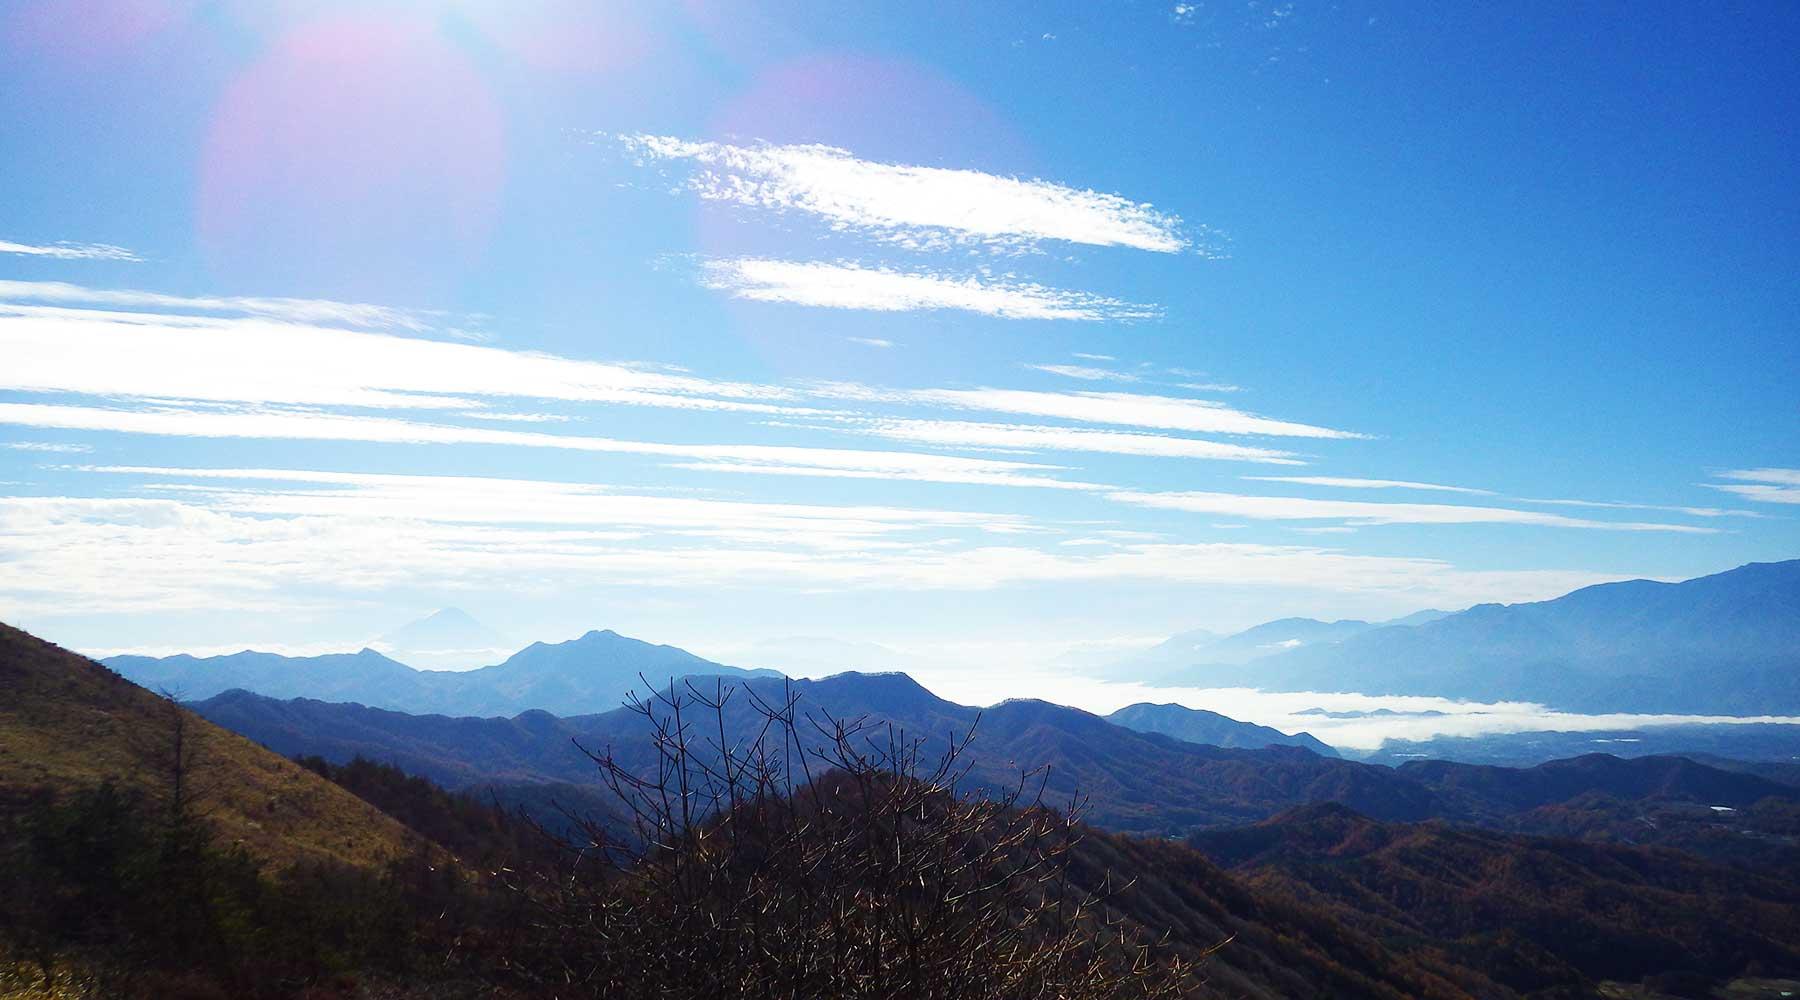 甲府盆地方面の雲海